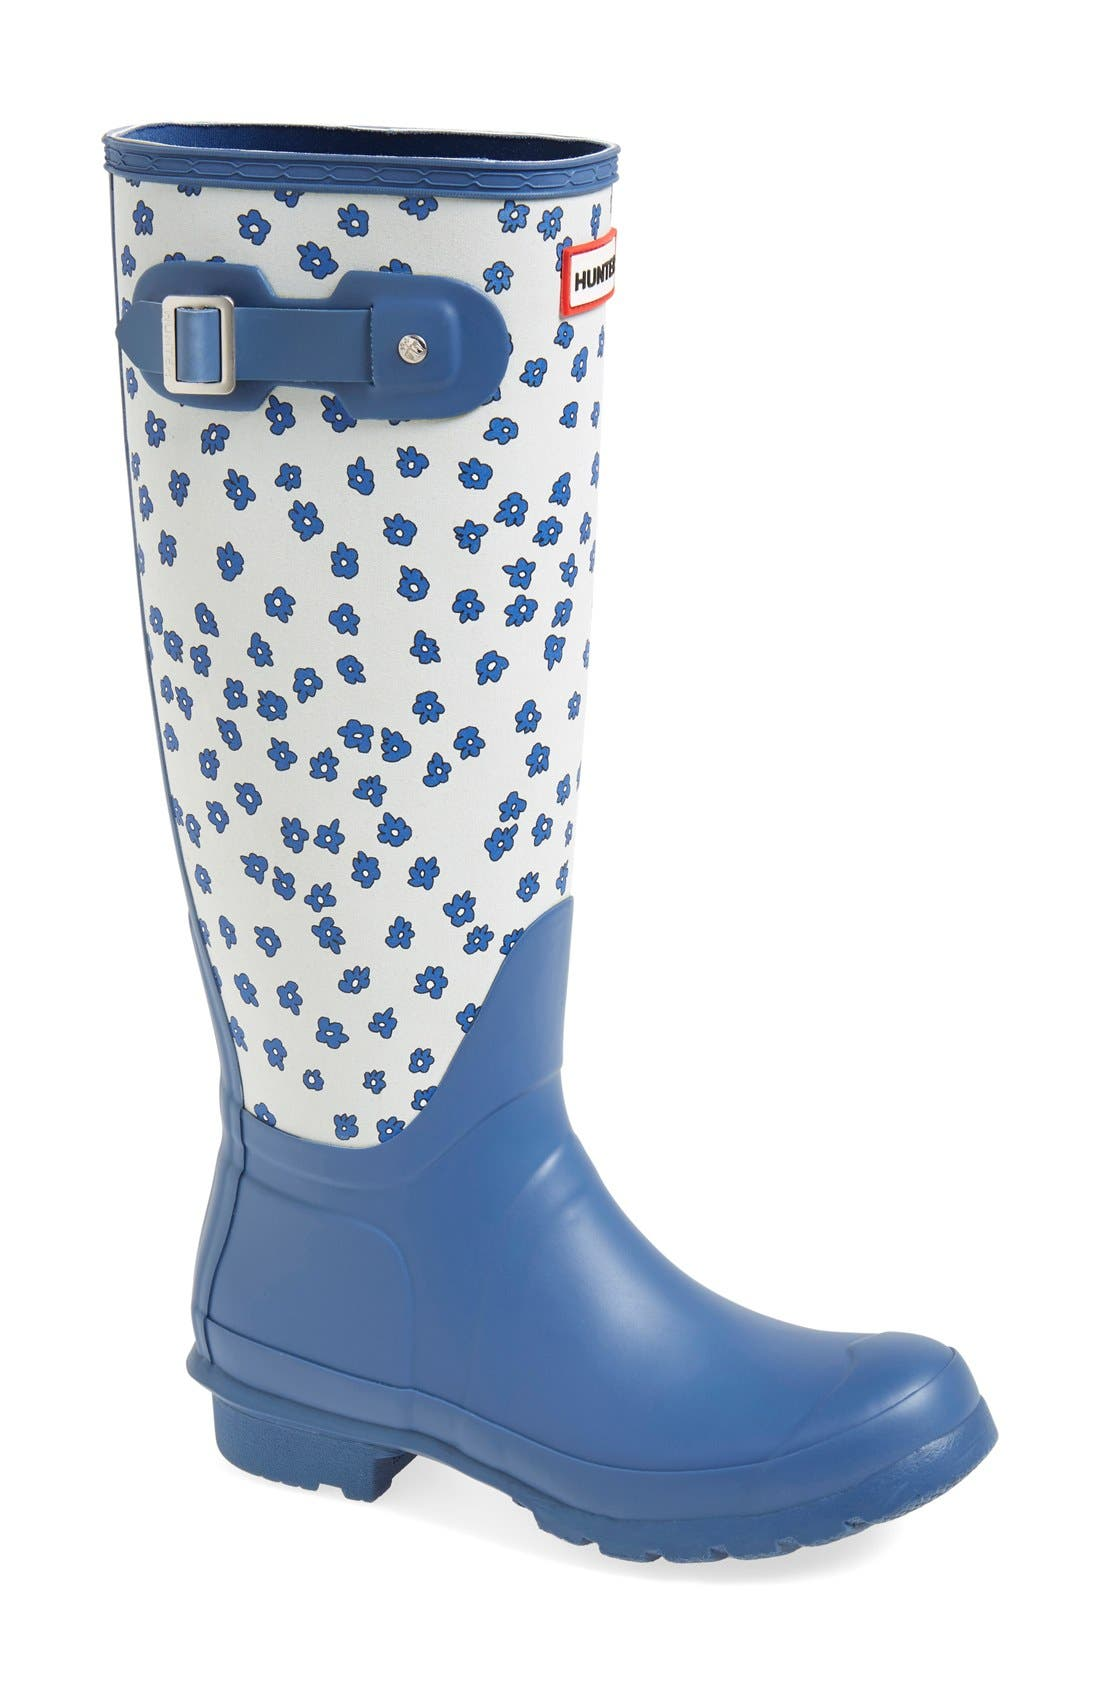 Alternate Image 1 Selected - Hunter 'Original Tall - Festival Floral' Rain Boot (Women)